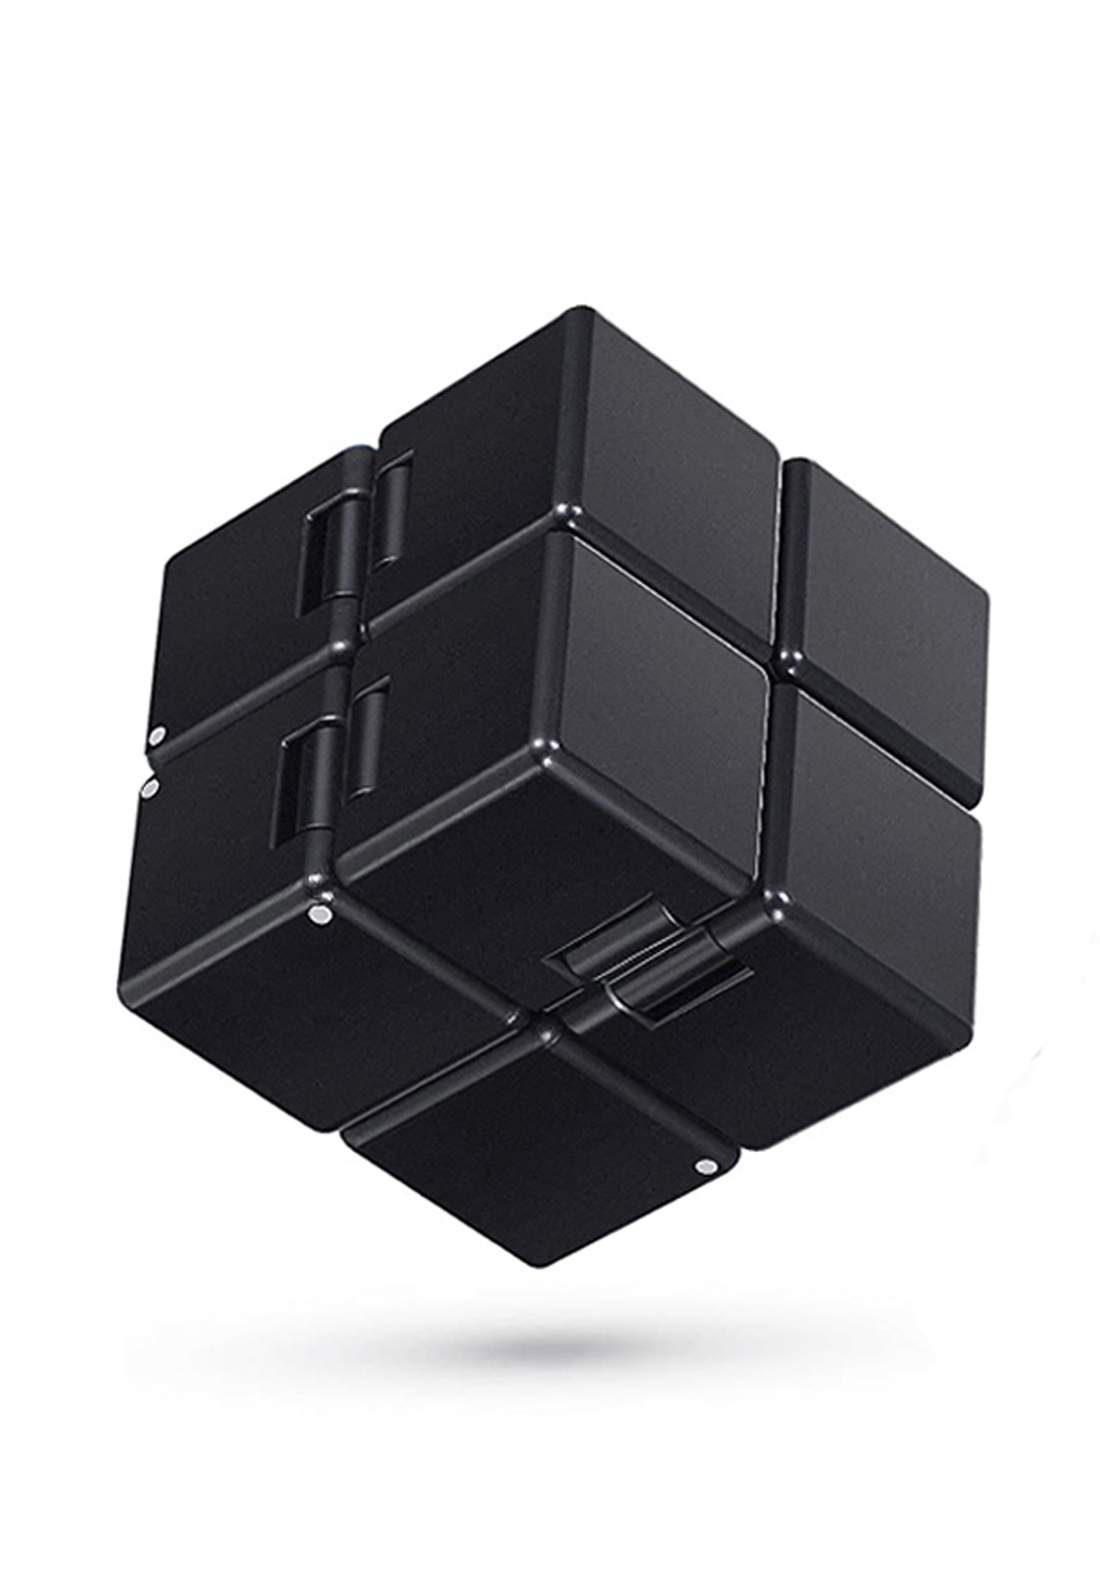 Game Cube Crazy  لعبة المكعب المجنون